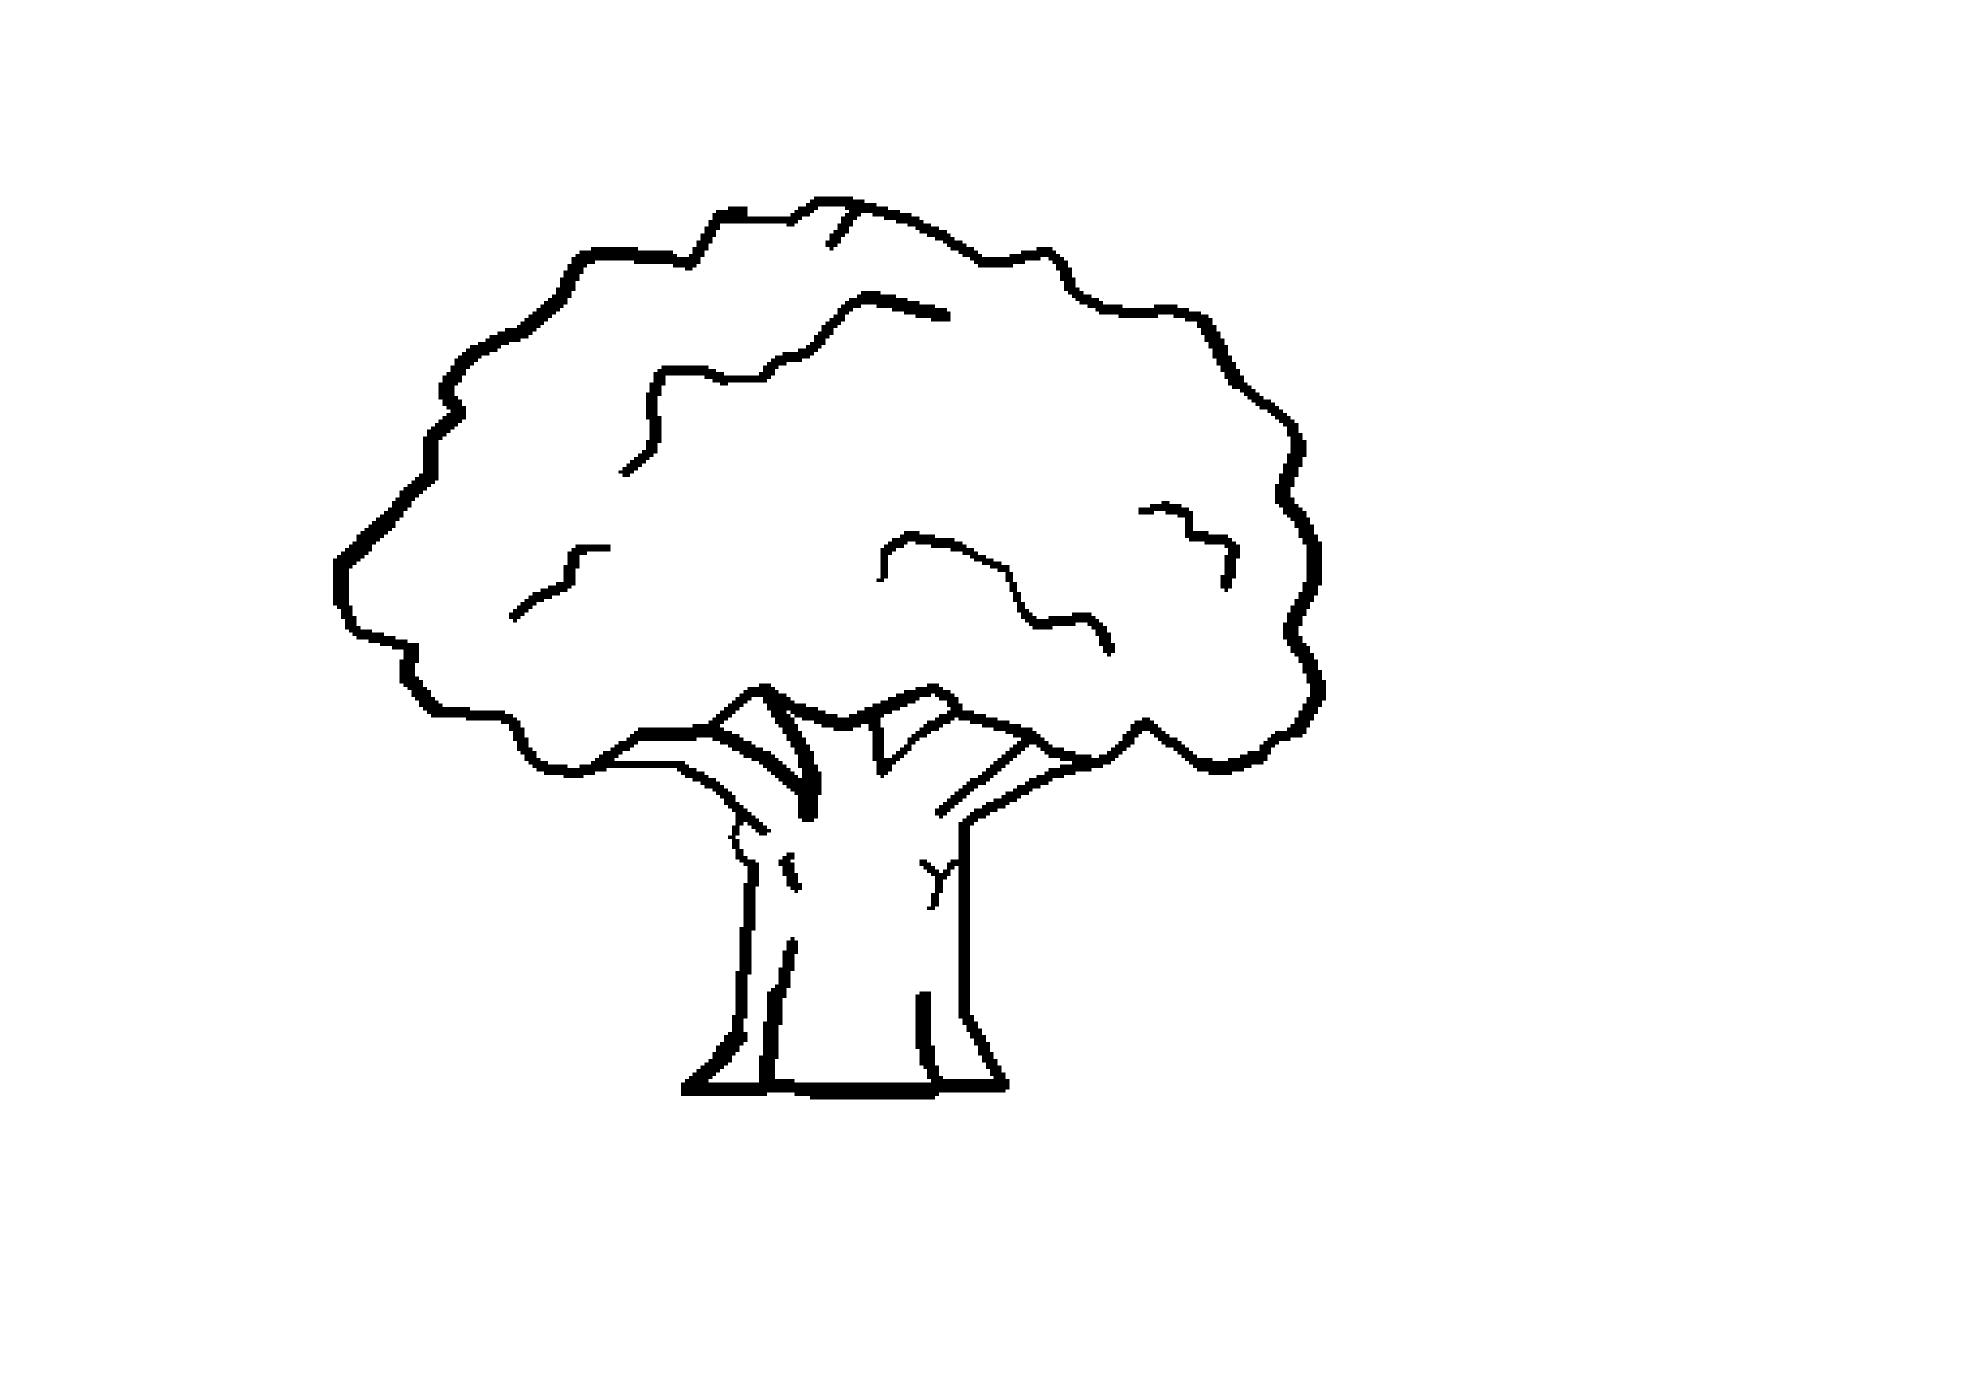 Clip Art: Tree Black White Line Art Coloring ... - ClipArt ...